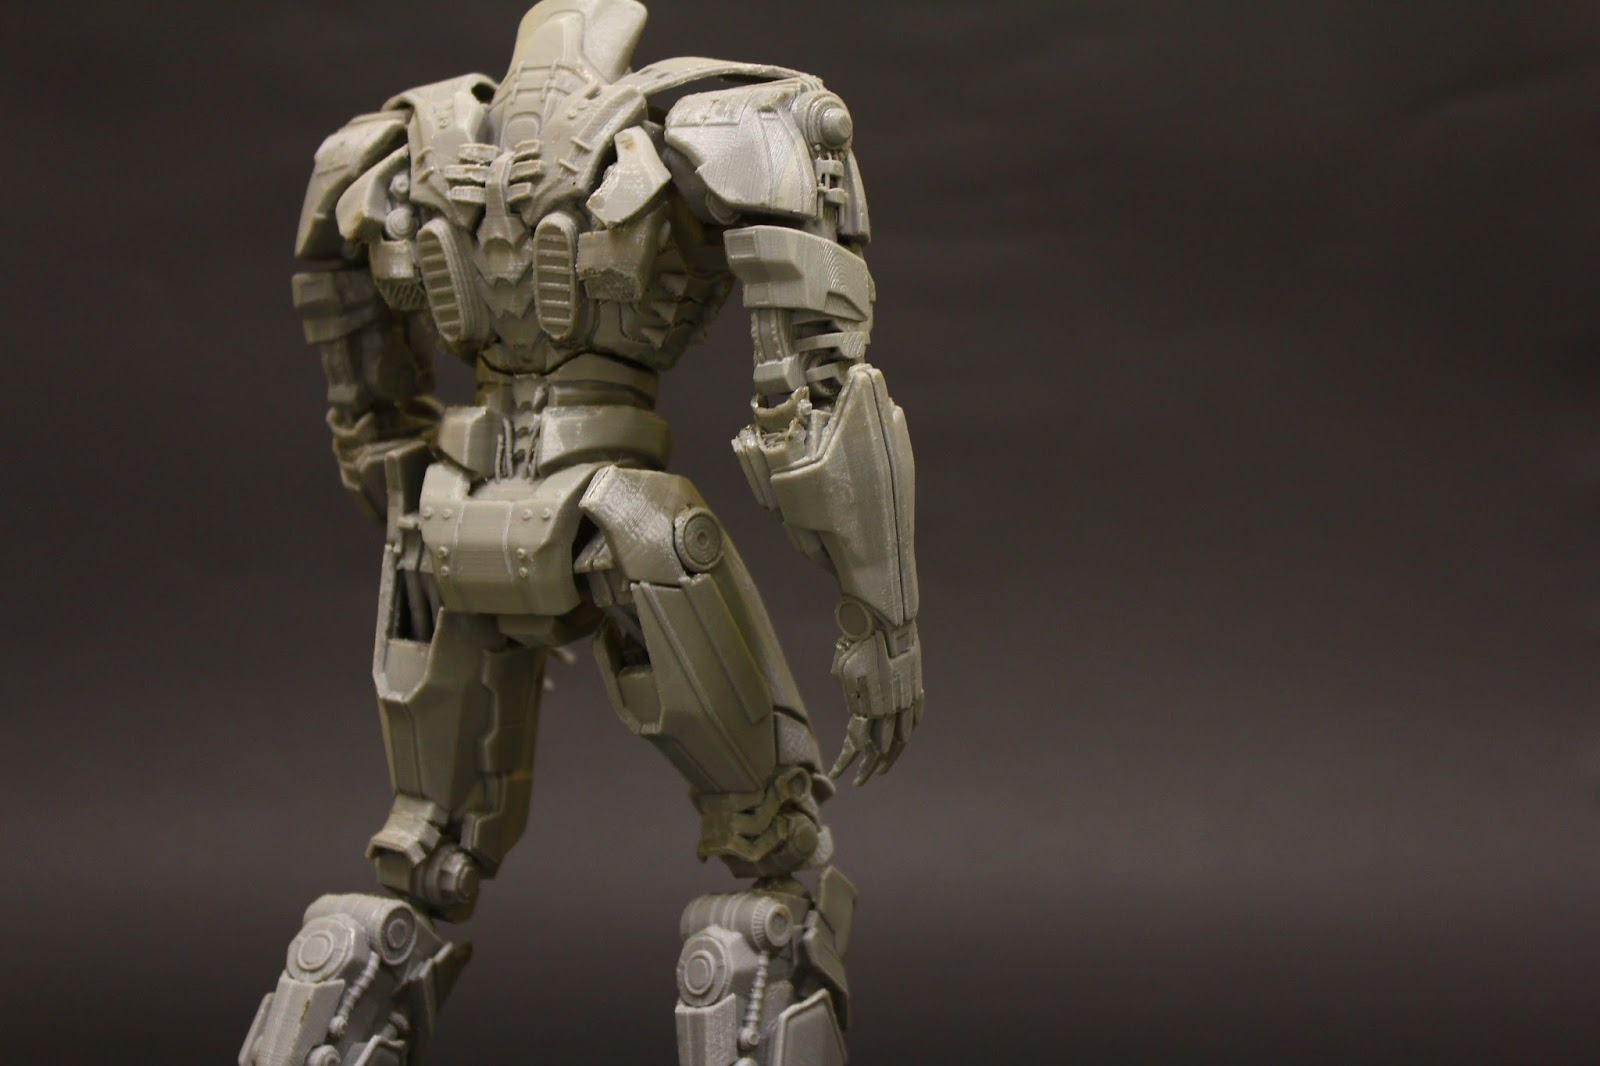 Pacific Rim-Gipsy Danger 3D Printing Model | Assembly 3D ... Pacific Rim Jaeger Gypsy Danger 3d Model